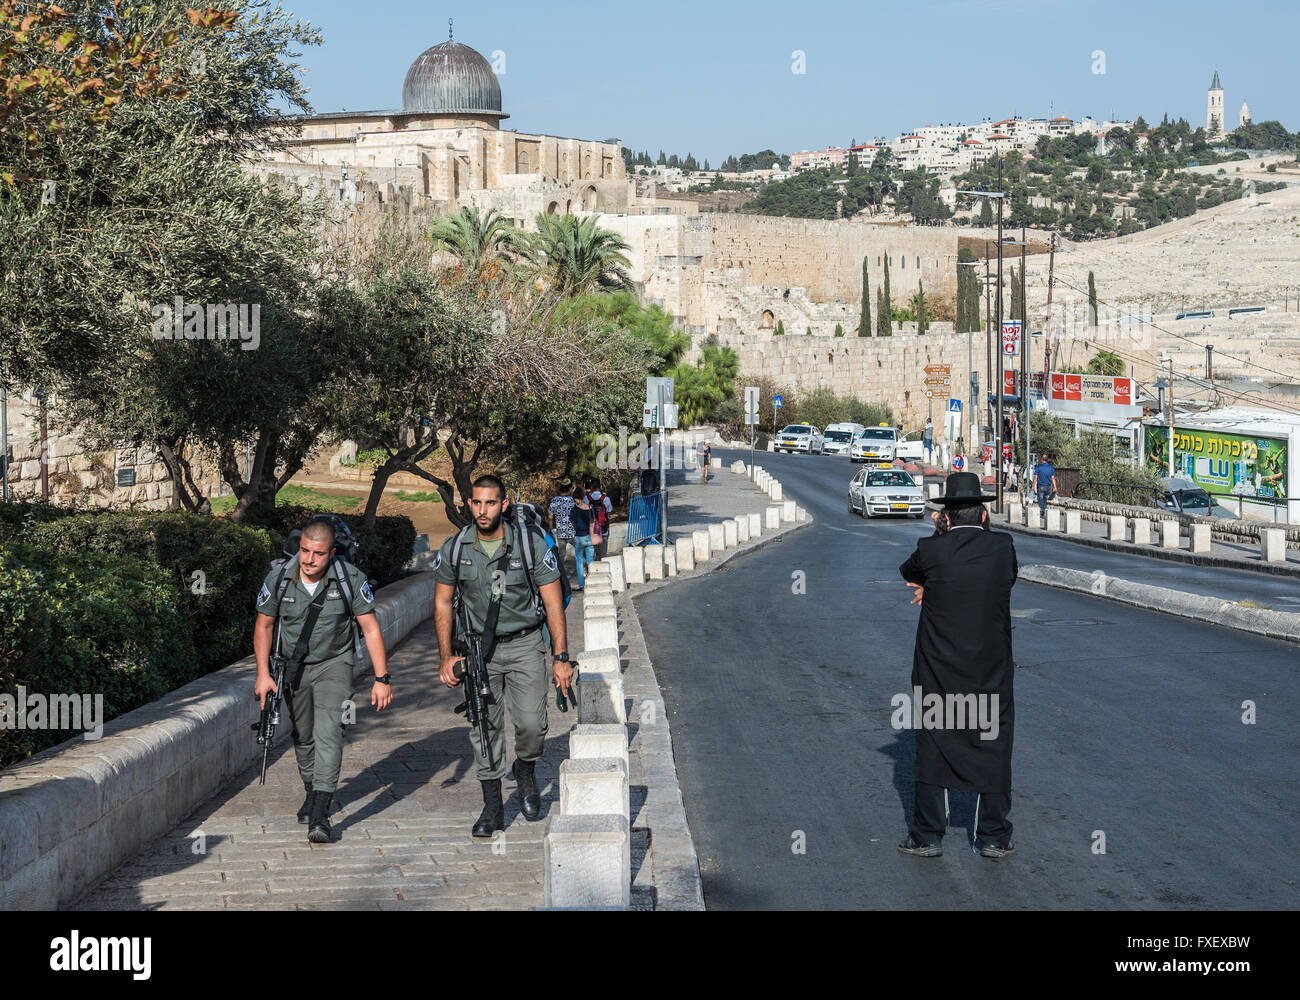 Orthodox Jew and Israeli Border Police patrol on Ma'ale HaShalom street in Jerusalem, Israel. Al-Aqsa Mosque - Stock Image